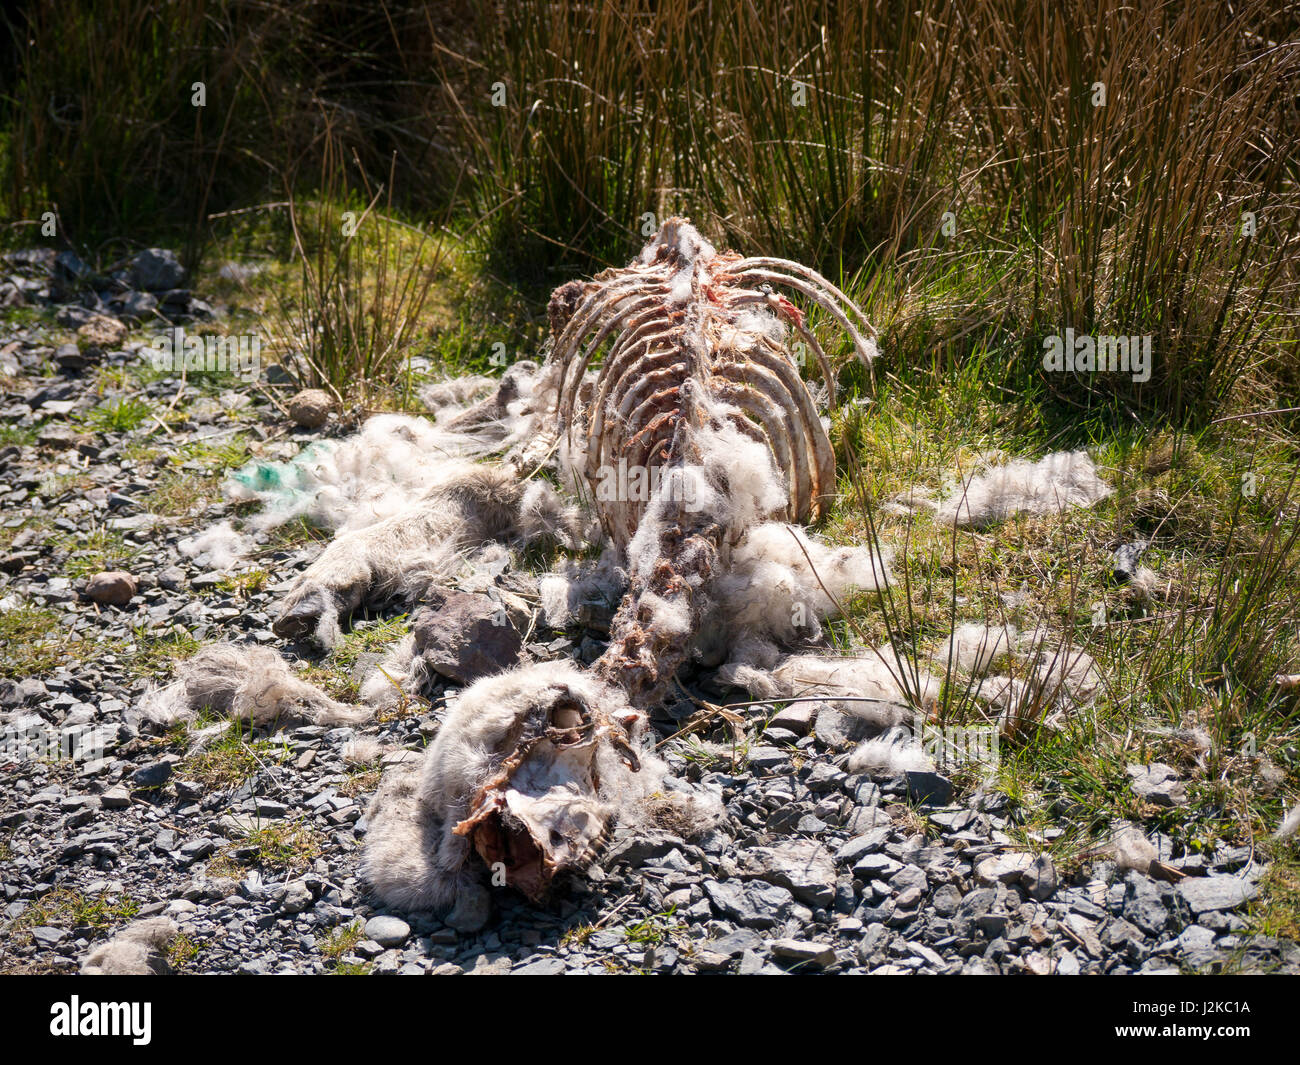 a-sheep-carcass-that-has-been-picked-clean-by-scavangers-lies-beside-J2KC1A.jpg